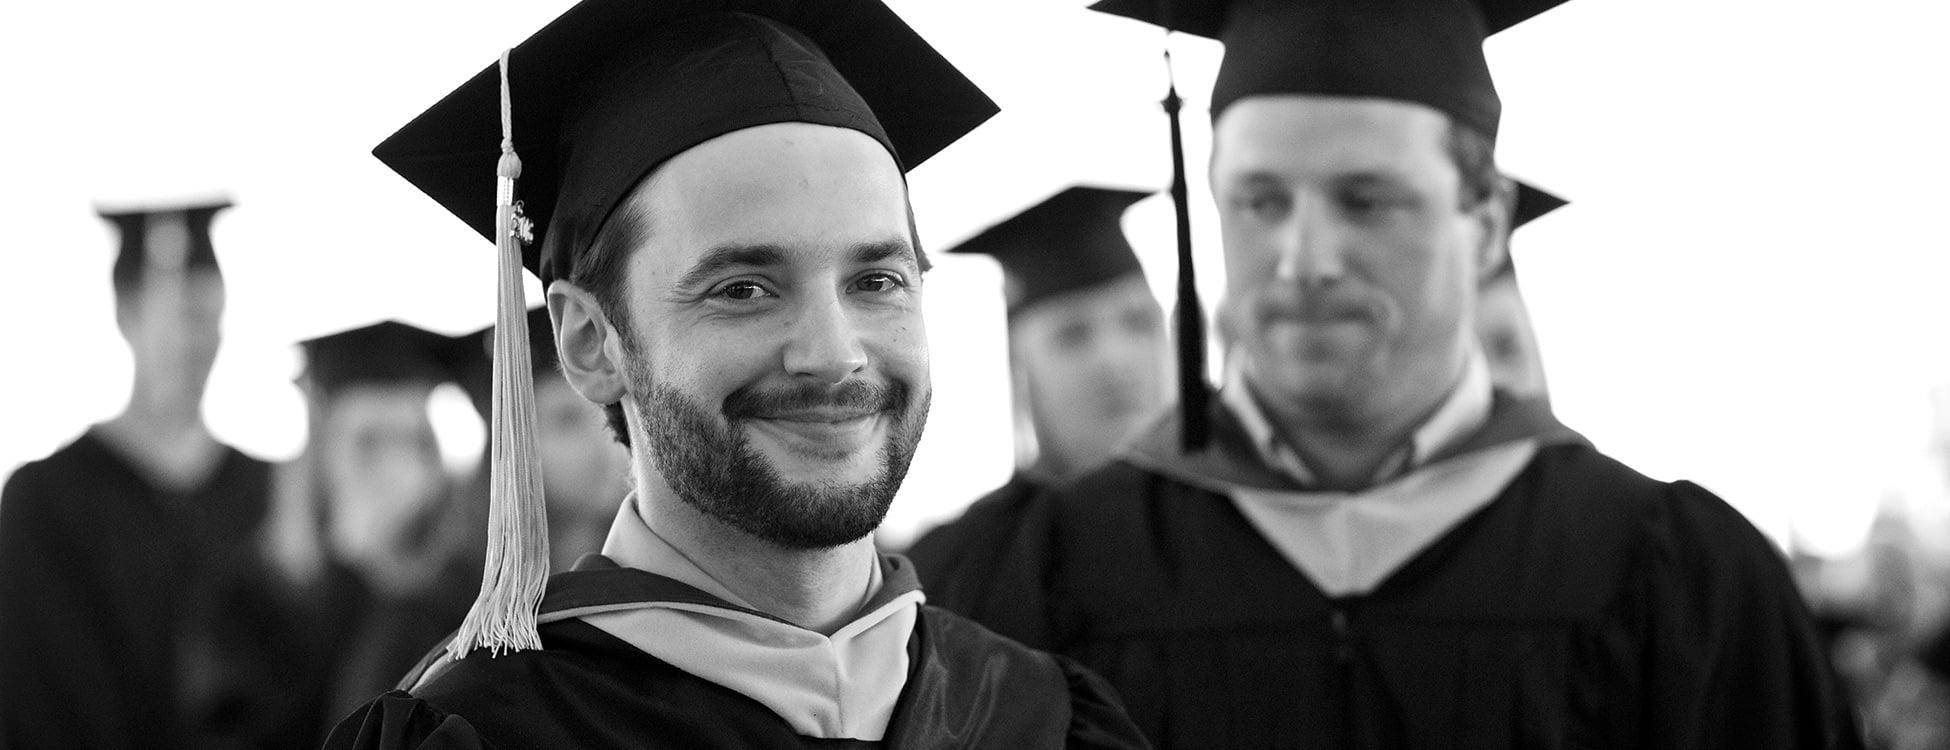 commencement, graduation, Lance Butler, congratulations, male student